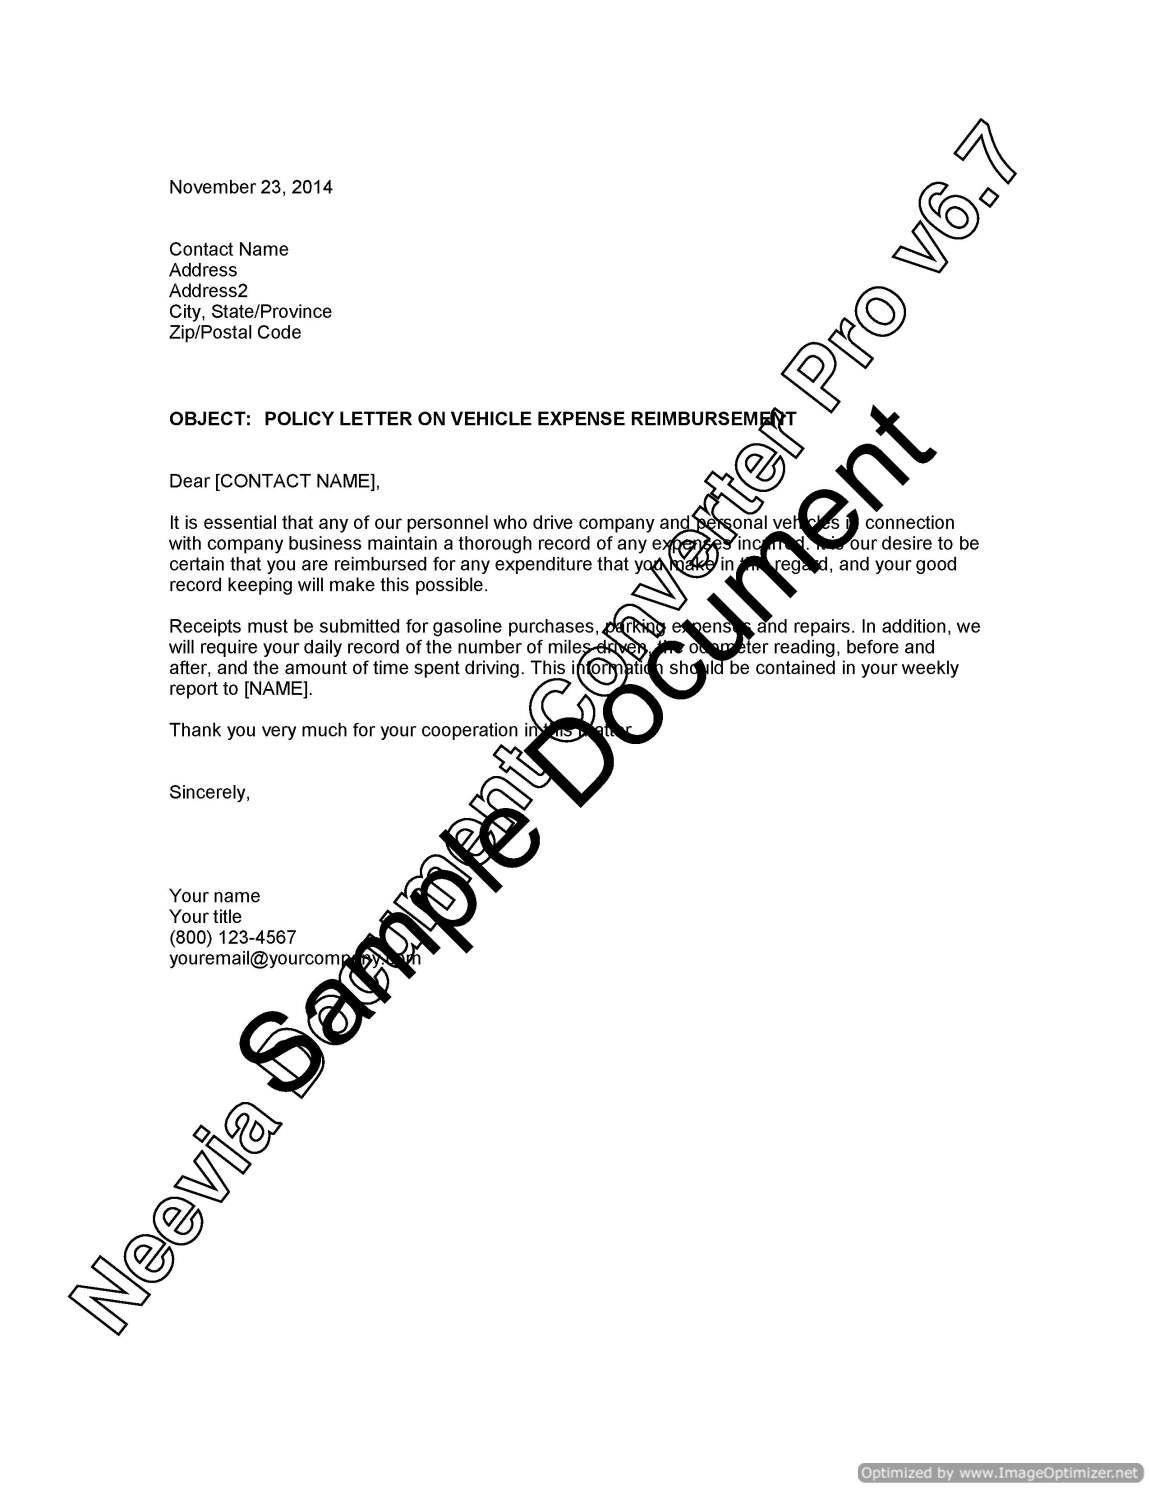 Policy Letter Vehicle Expense Reimbursement Lawyer  Home Design